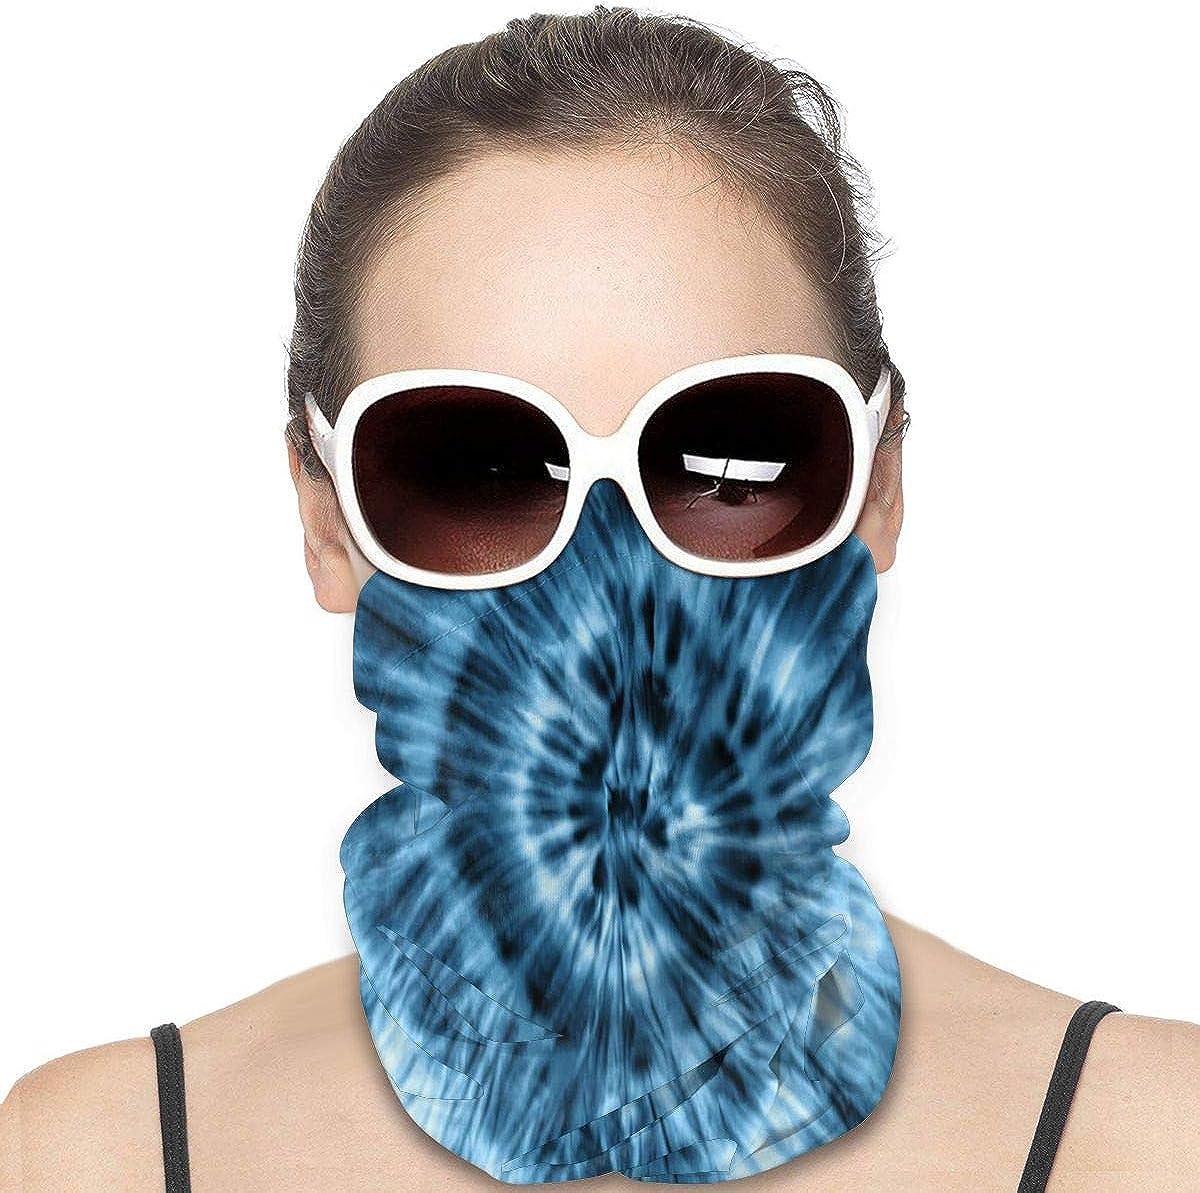 KiuLoam Women Bandanas Face Mask, Washed Blue Tie Dye Neck Gaiter Mask Headband for Men Face Scarf Dust, Outdoors, Sports